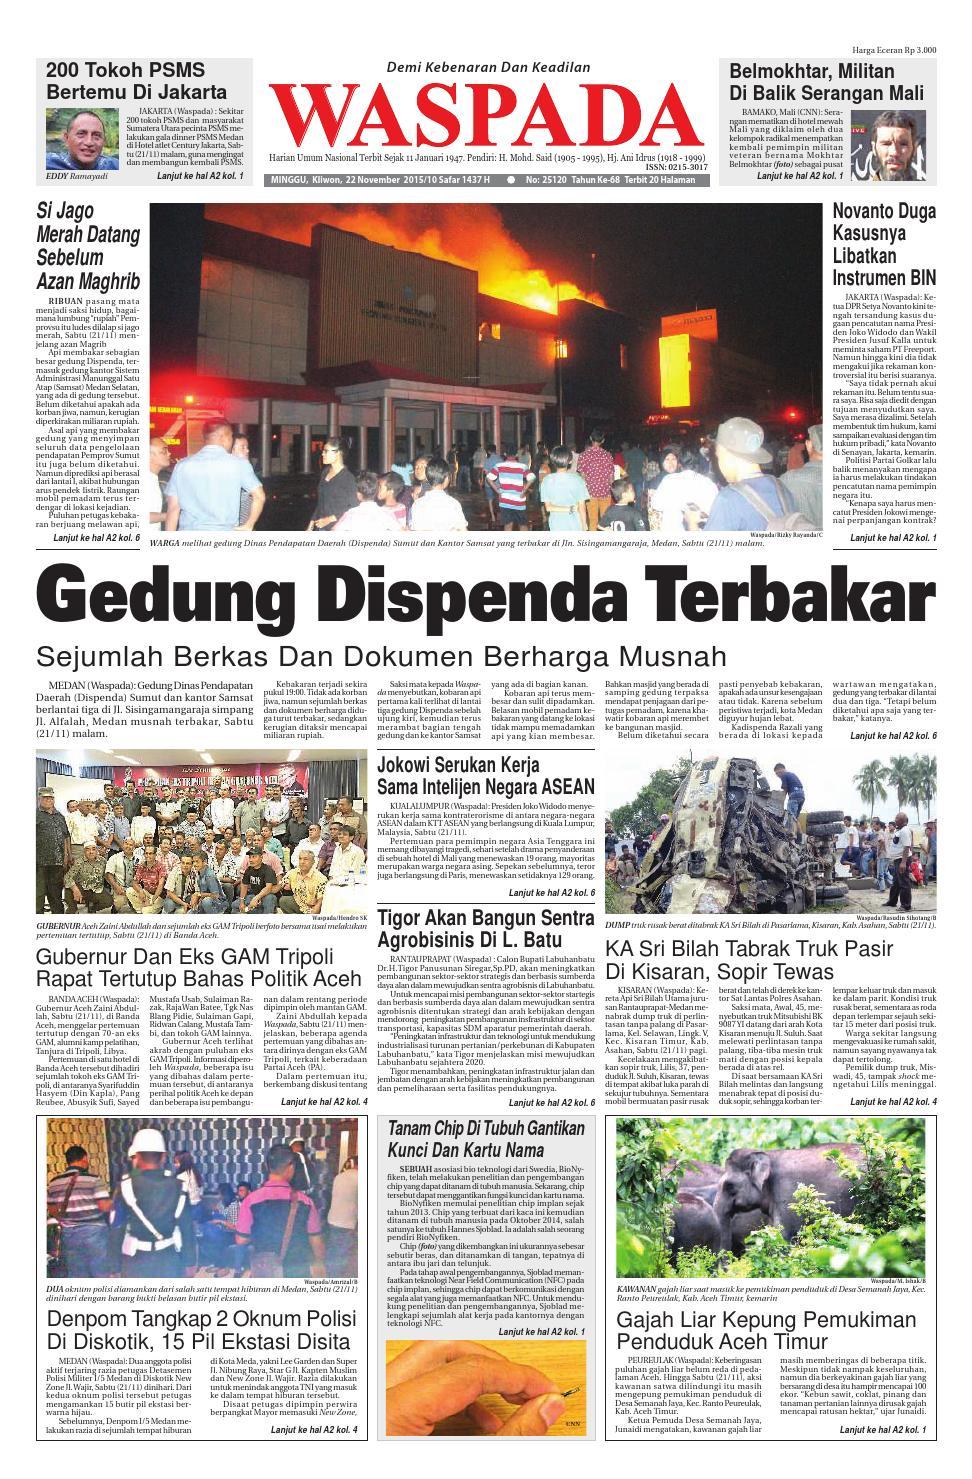 Waspada Minggu 22 November 2015 By Harian Waspada Issuu